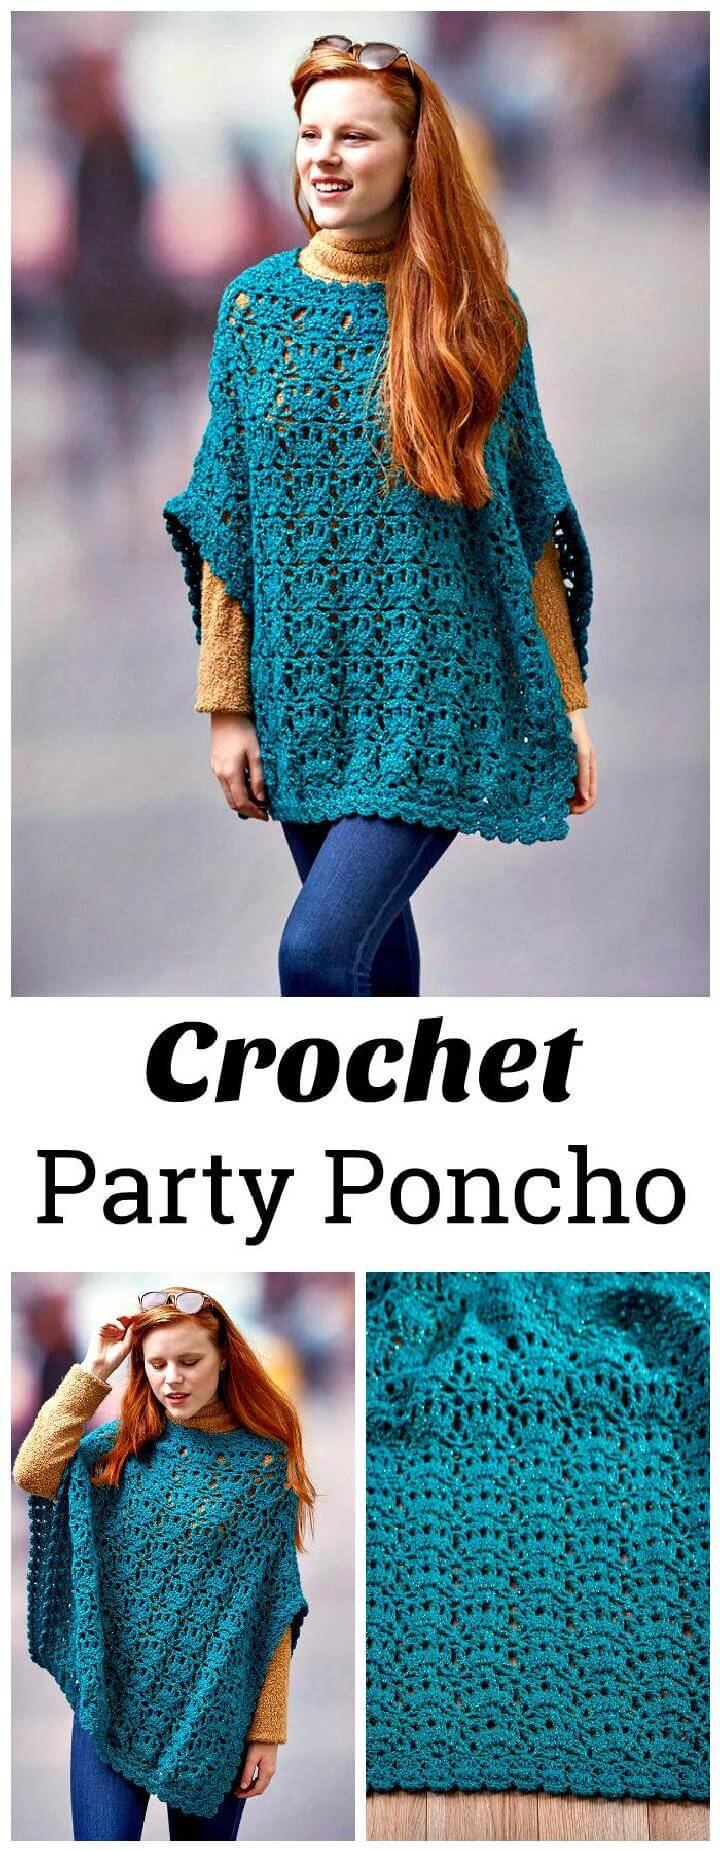 Crochet Party Poncho